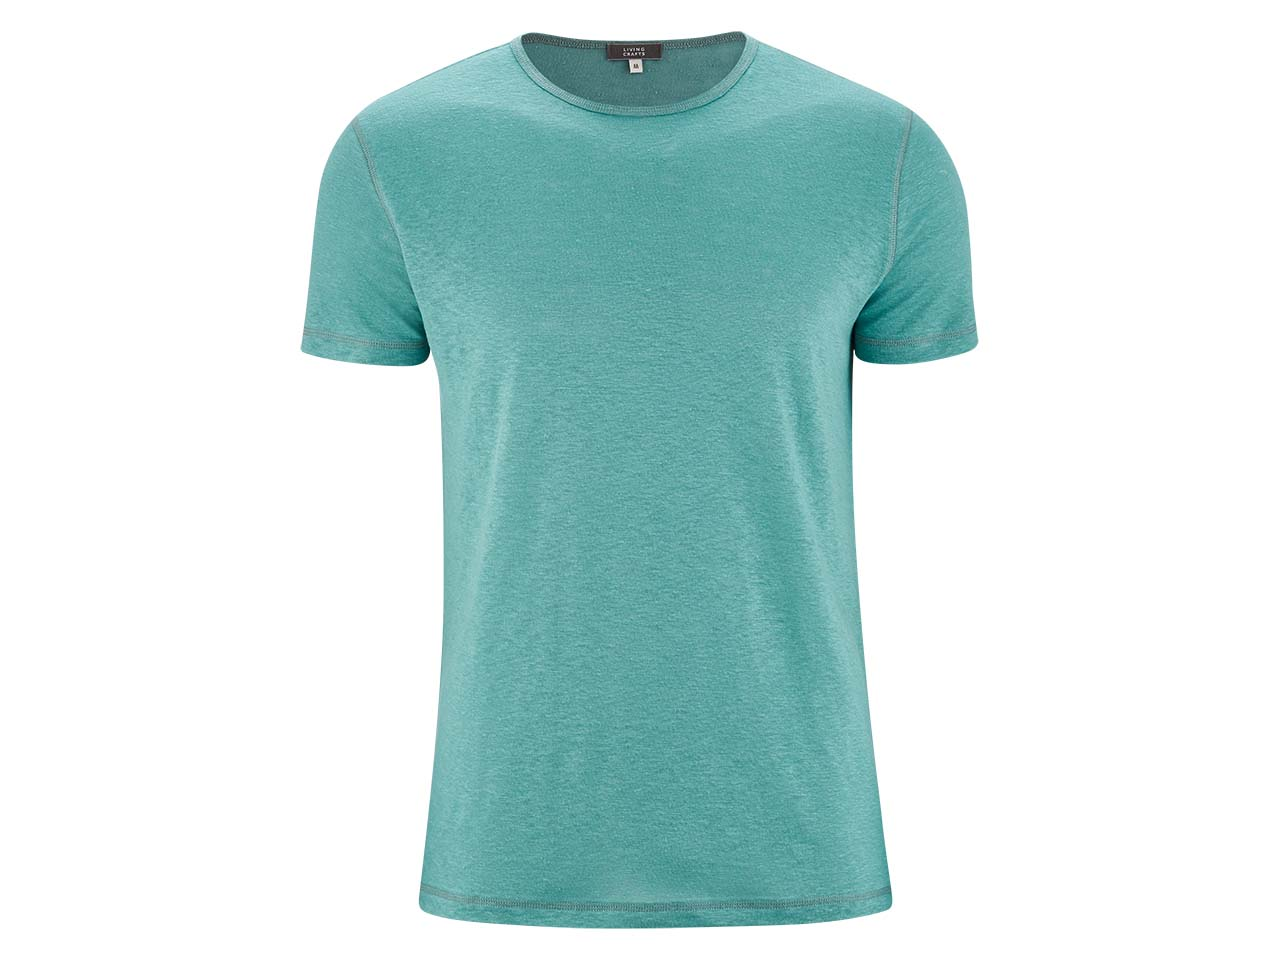 e48810c73f1cef Living Crafts Bio-Herren-T-Shirt